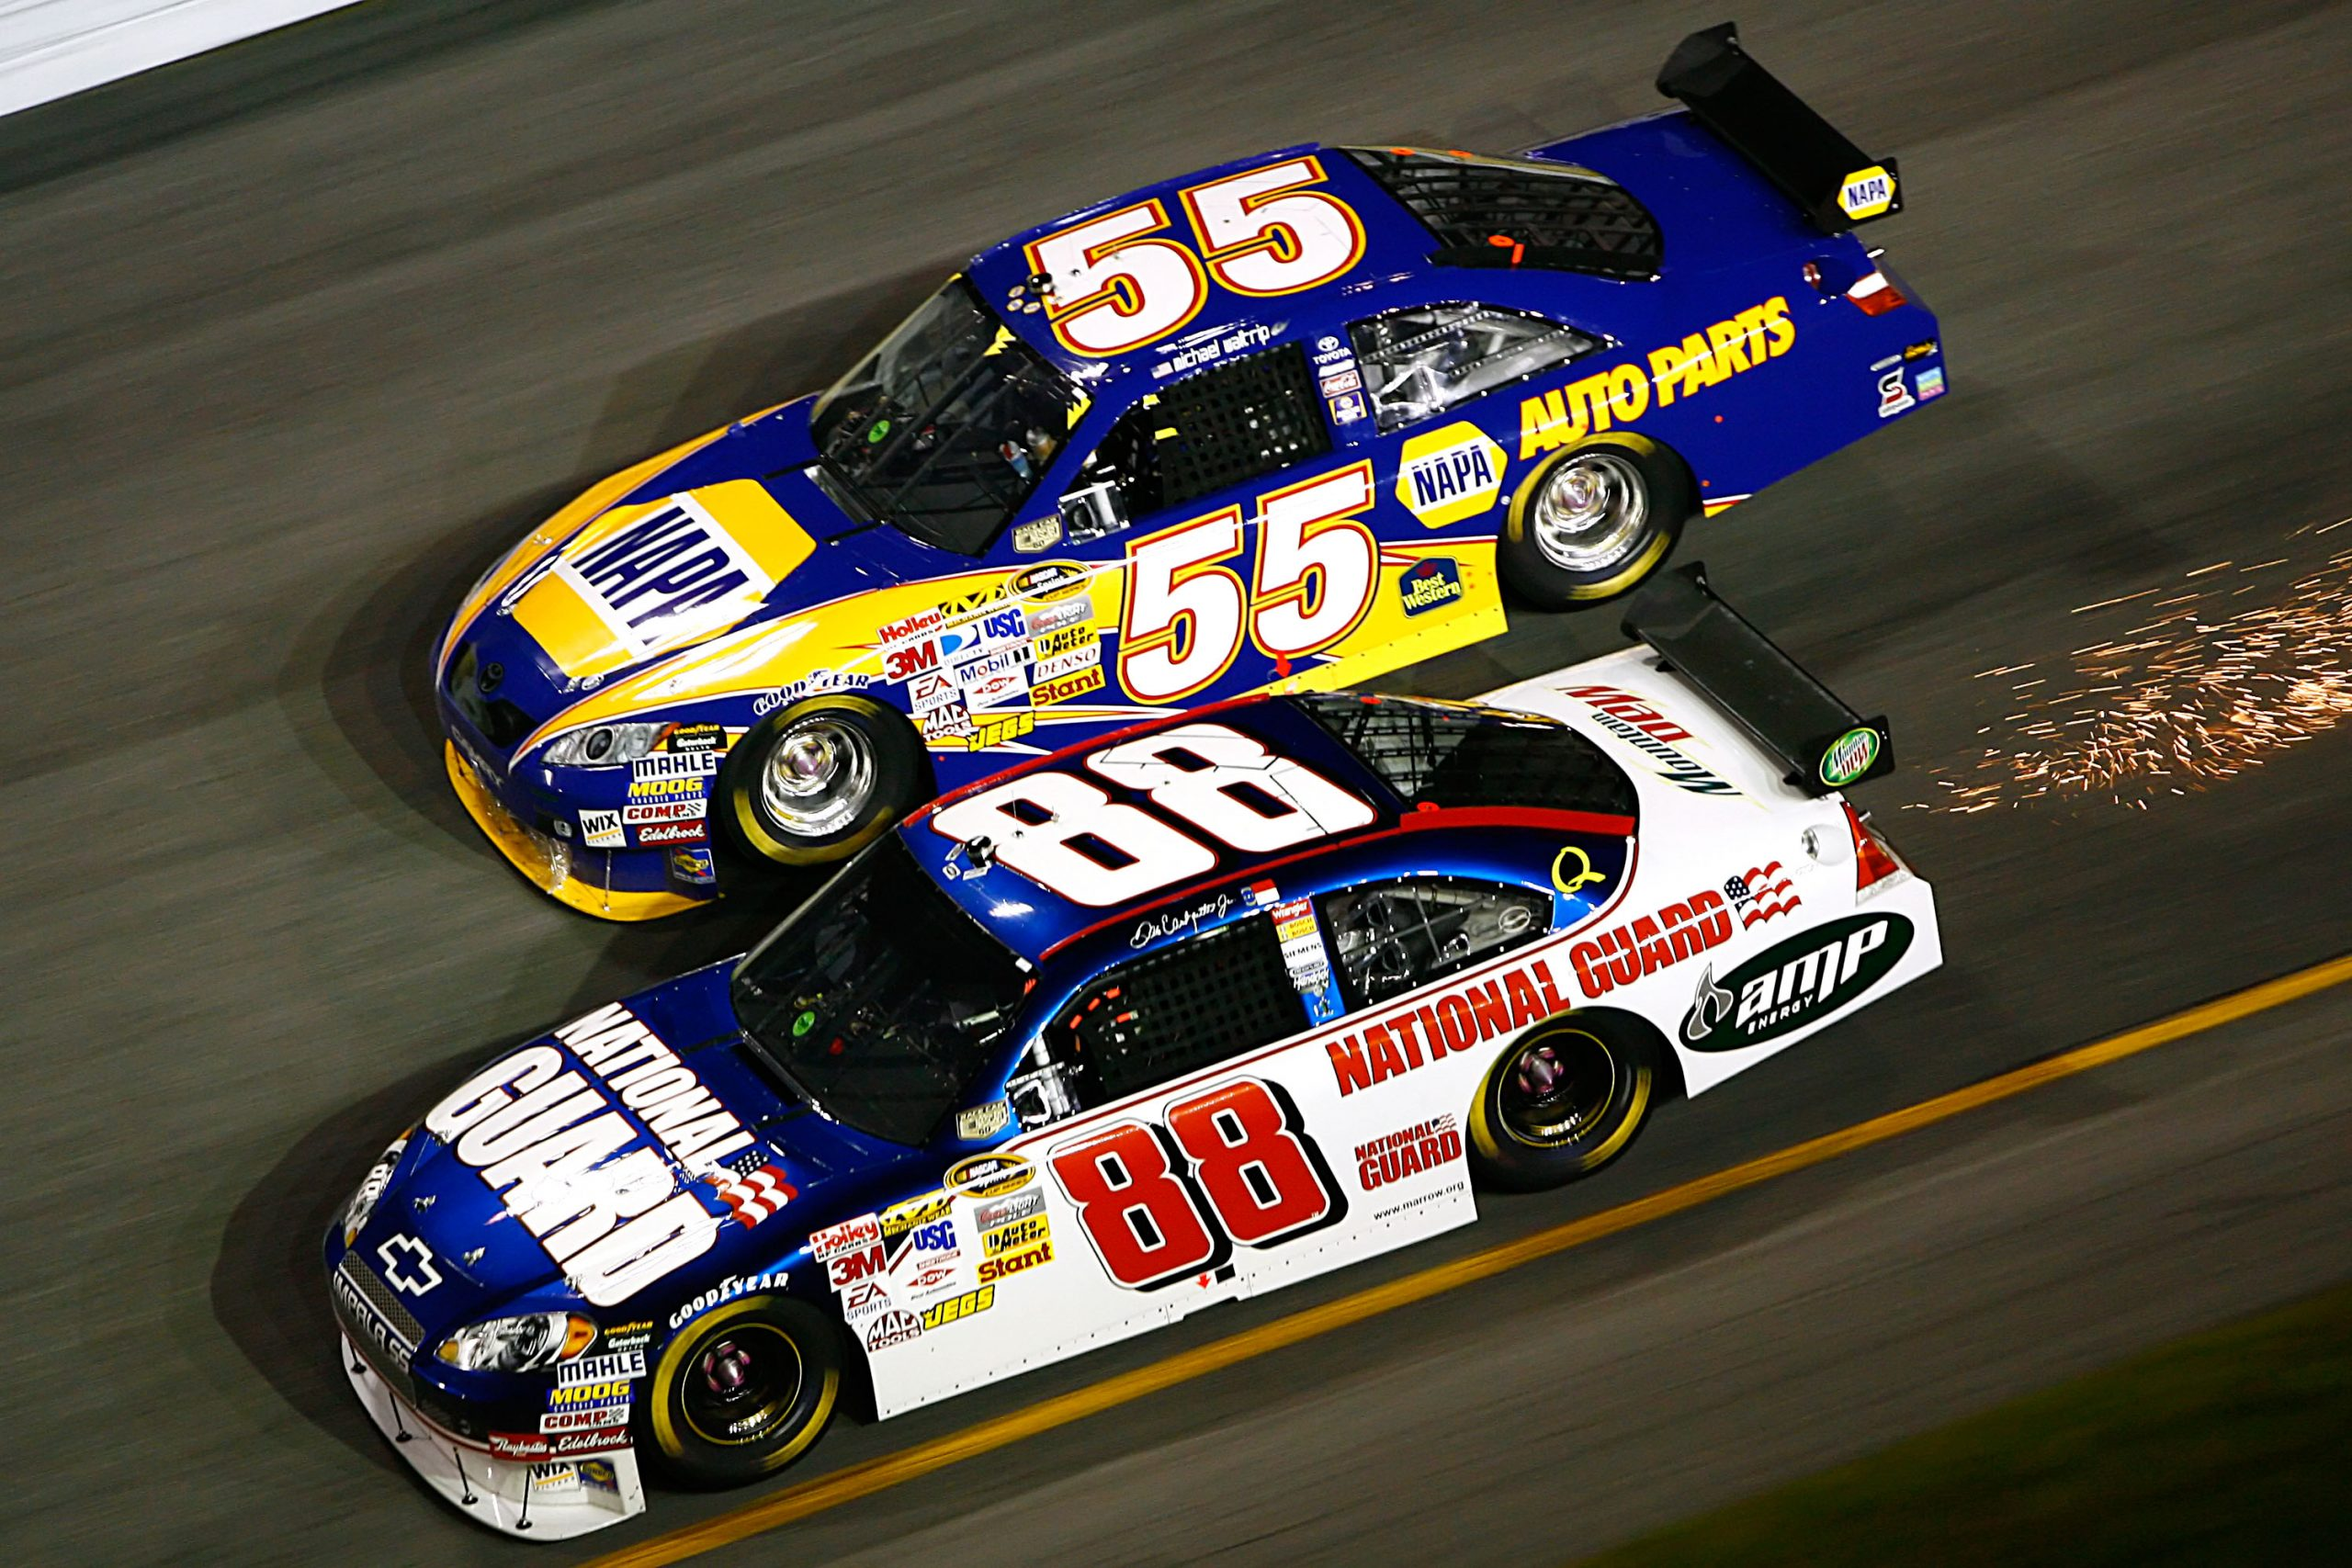 Dale Earnhardt Jr NASCAR Car of Tomorrow